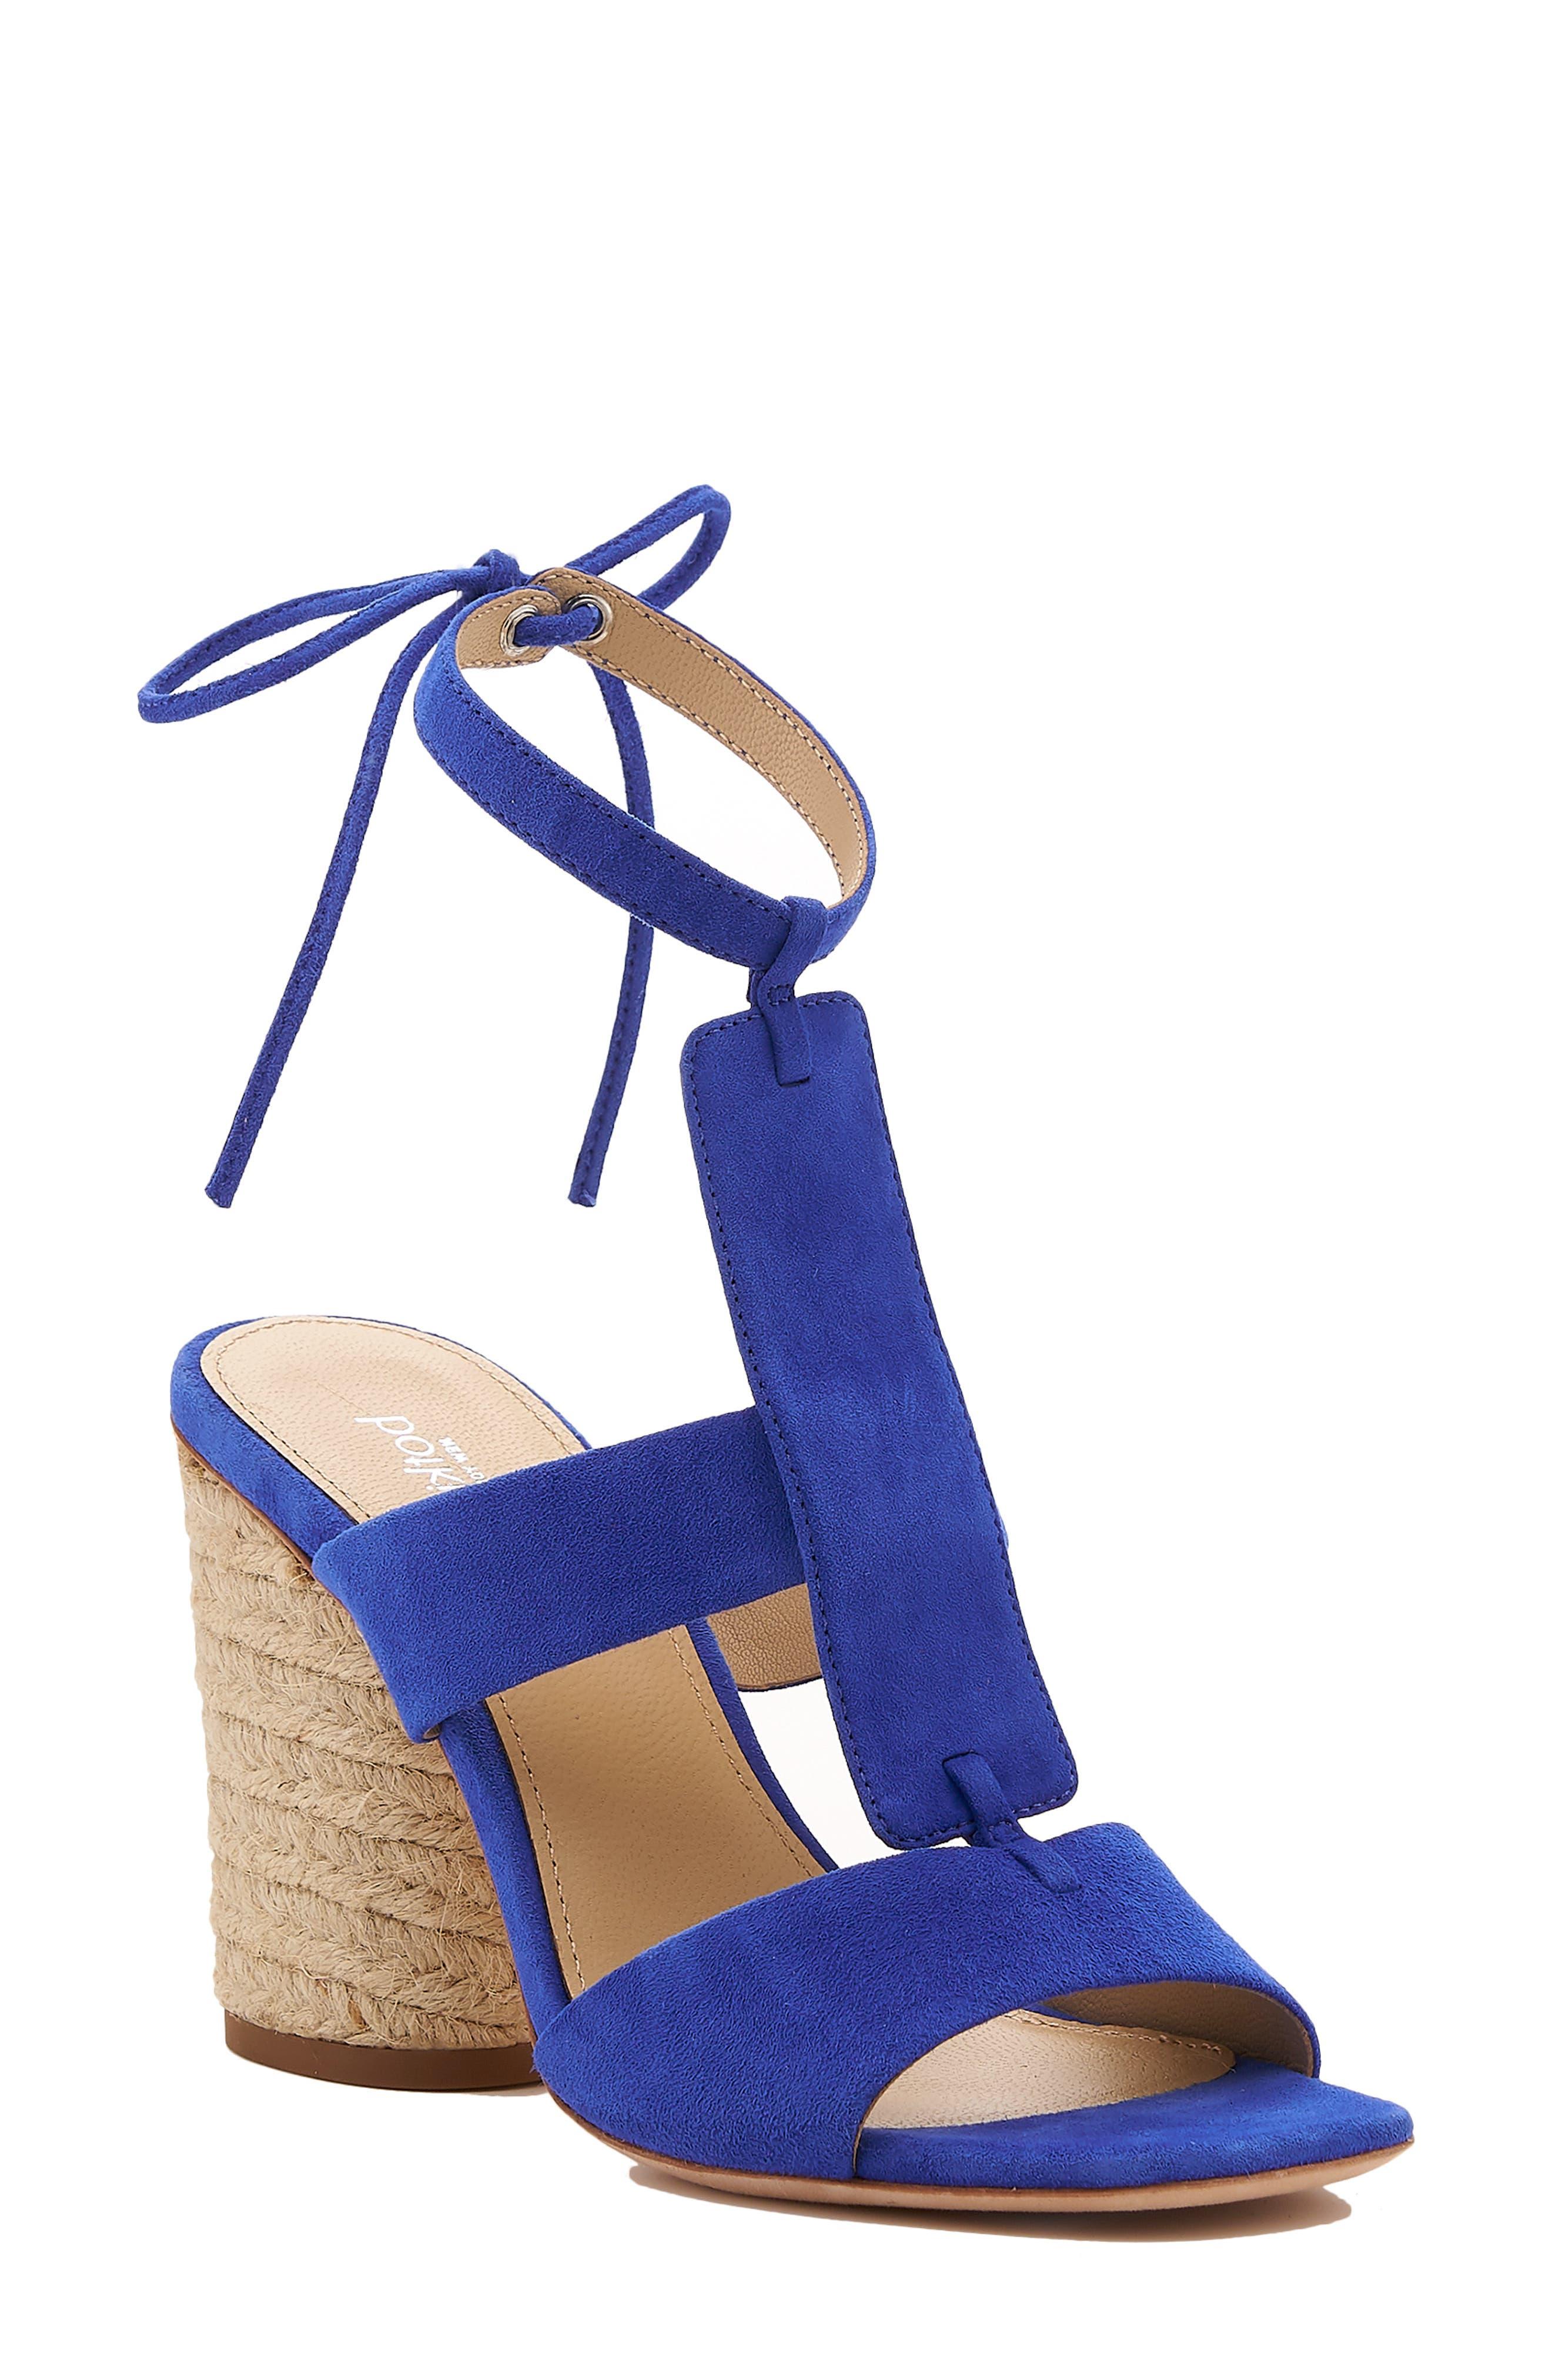 Botkier Alexia Sandal- Blue